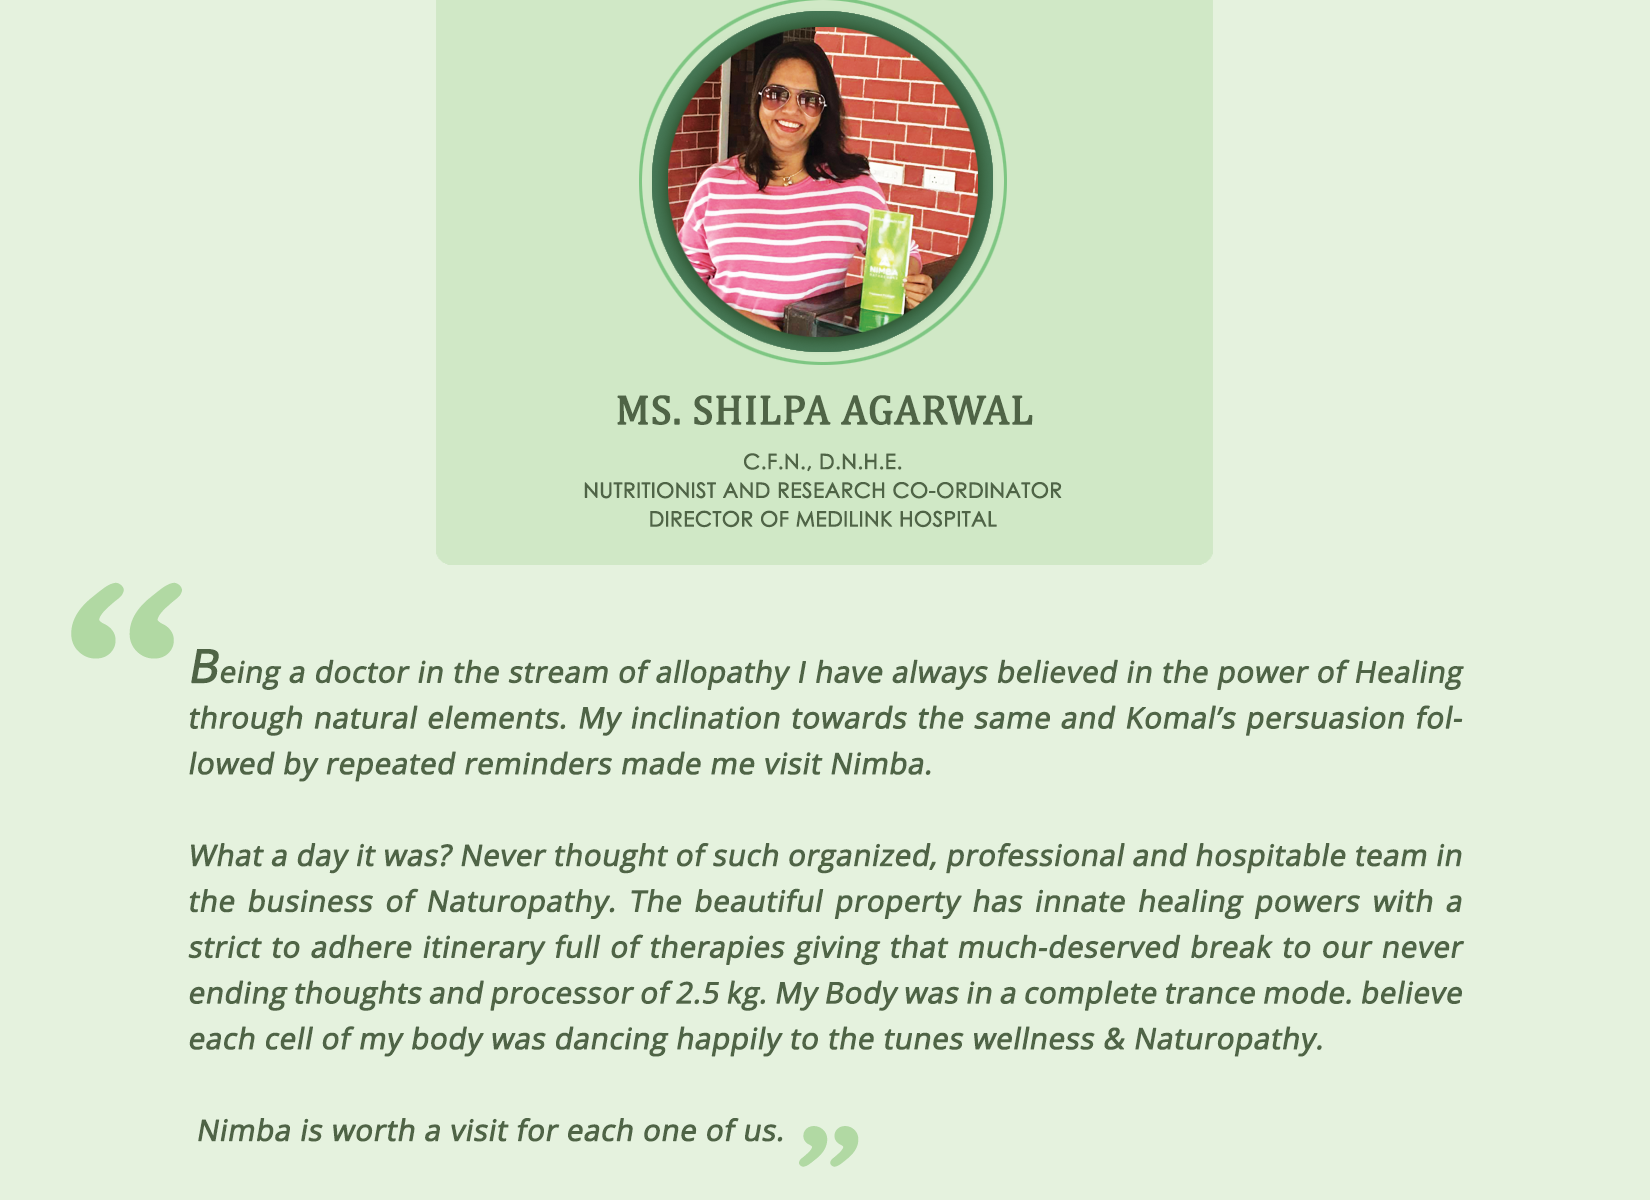 Shilpa Agarwal experienced Naturopathy